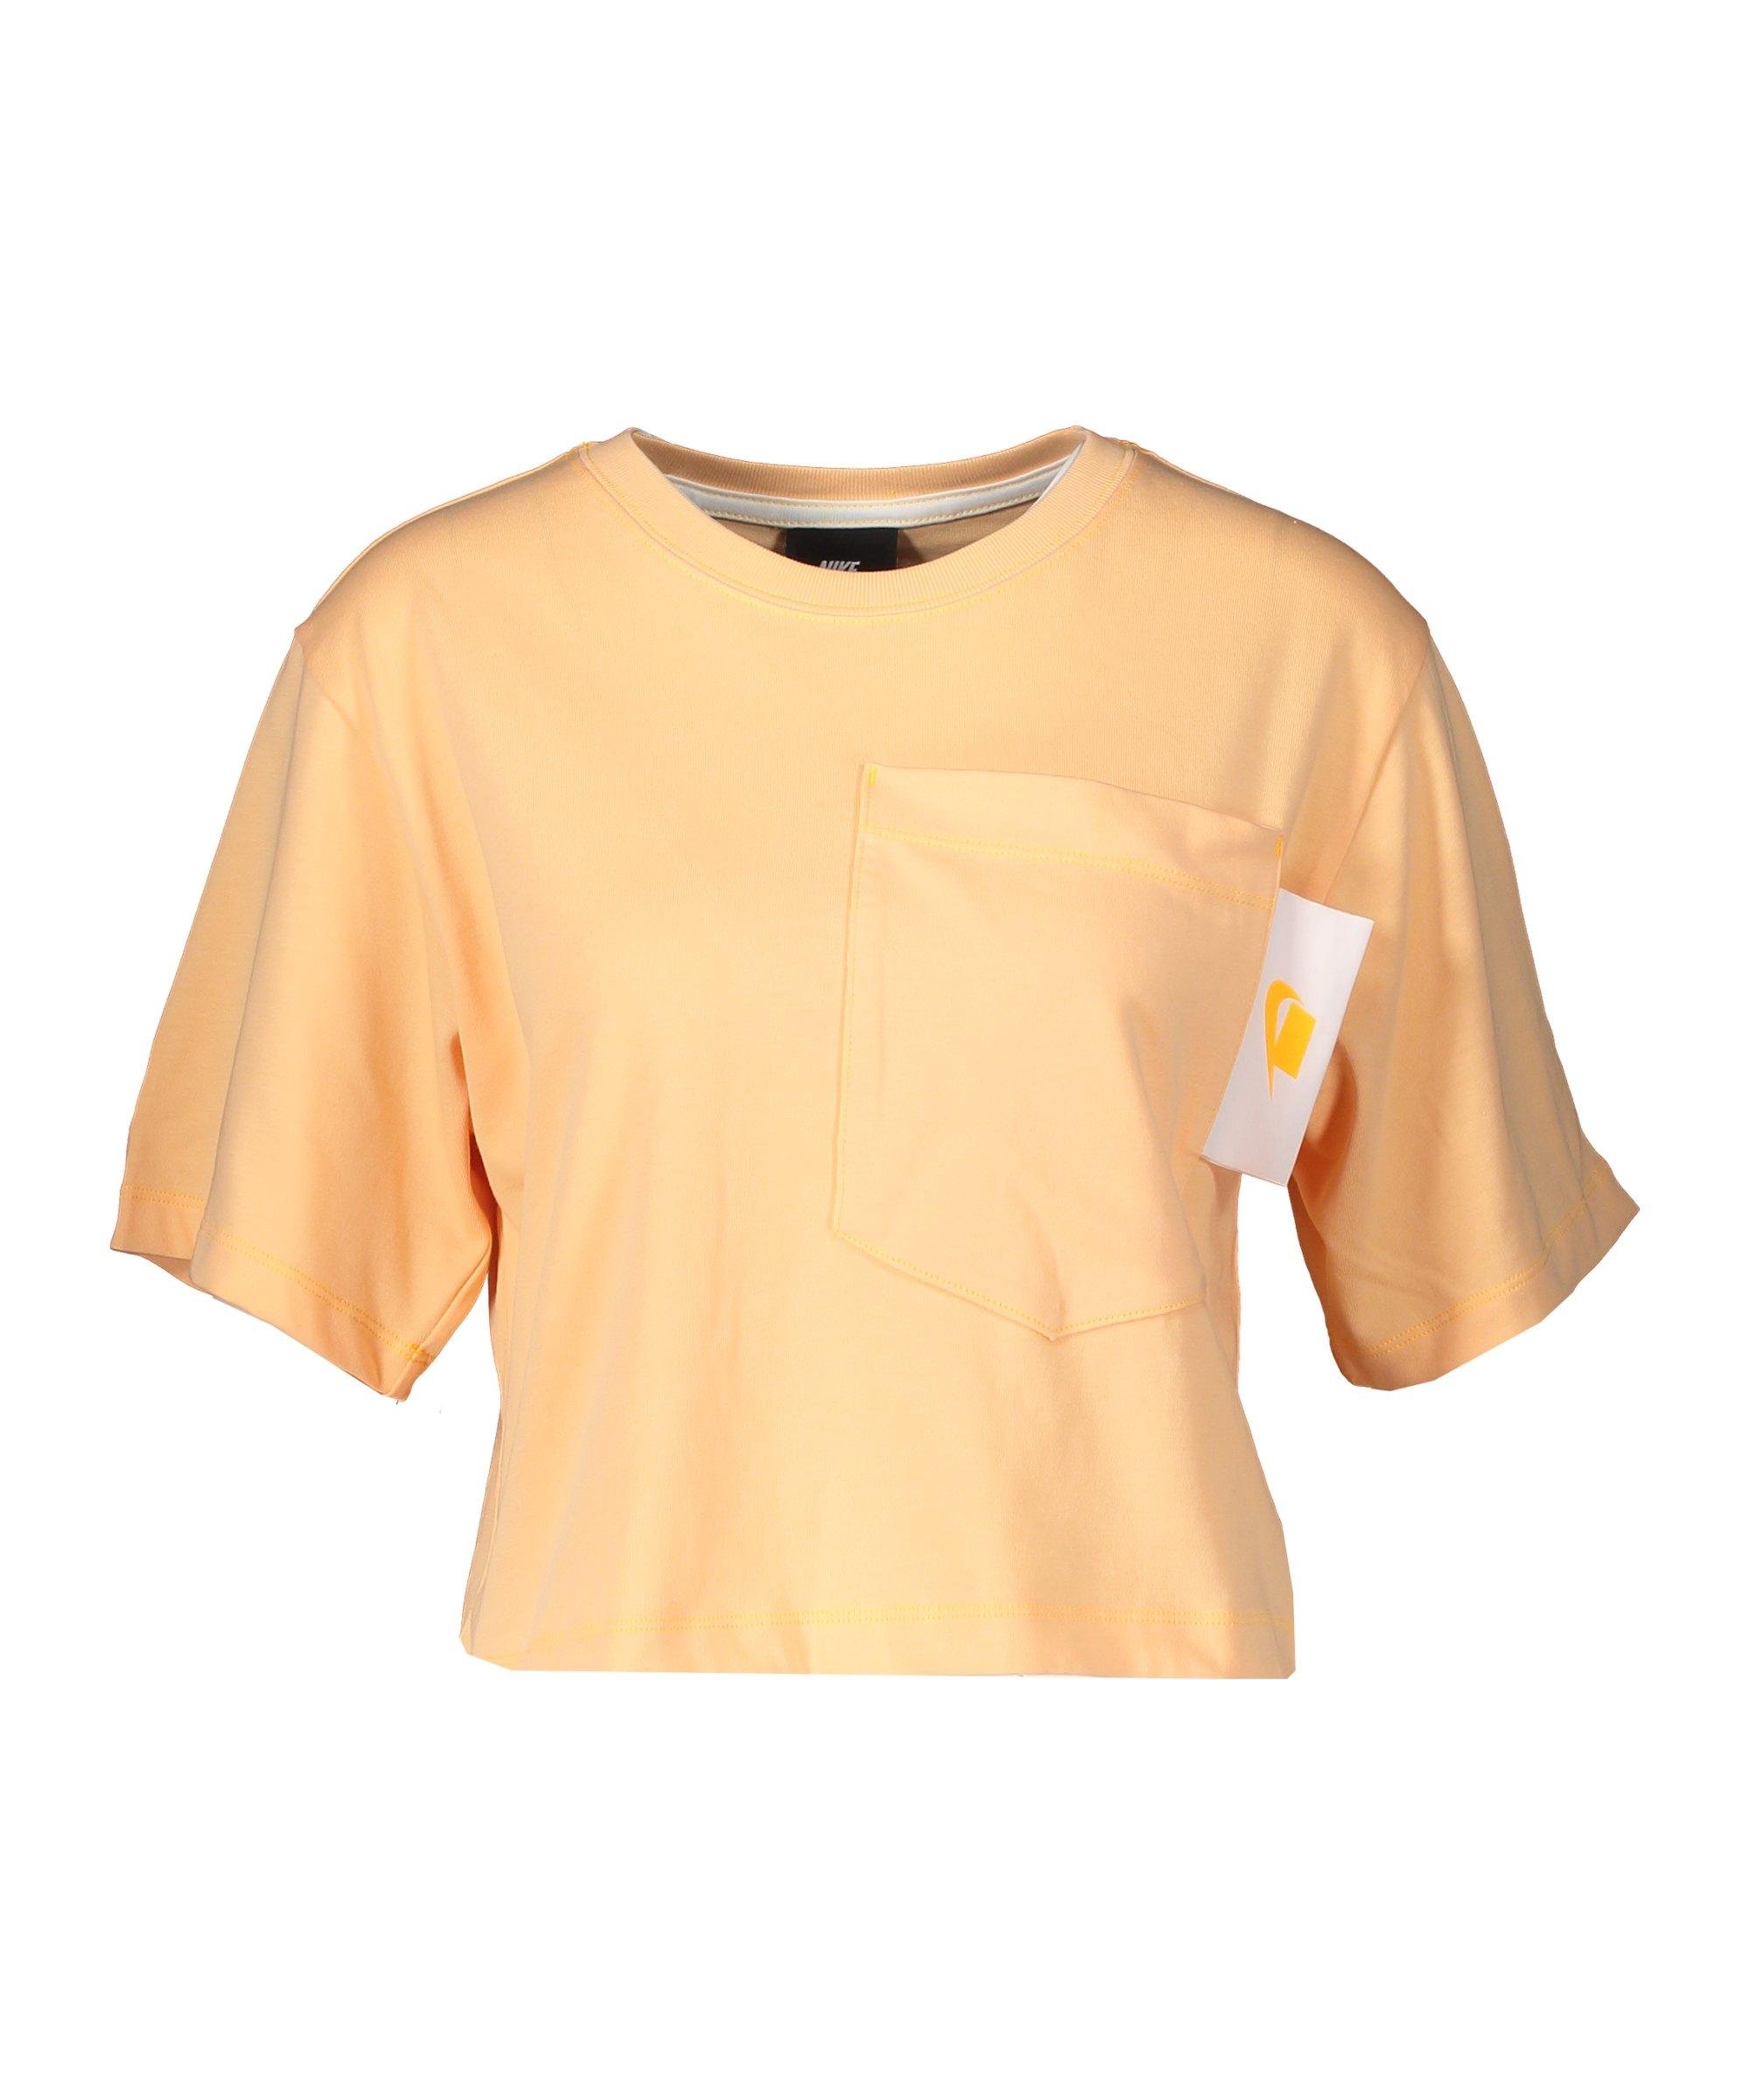 Nike Crop T-Shirt Damen Gelb F714 - gelb